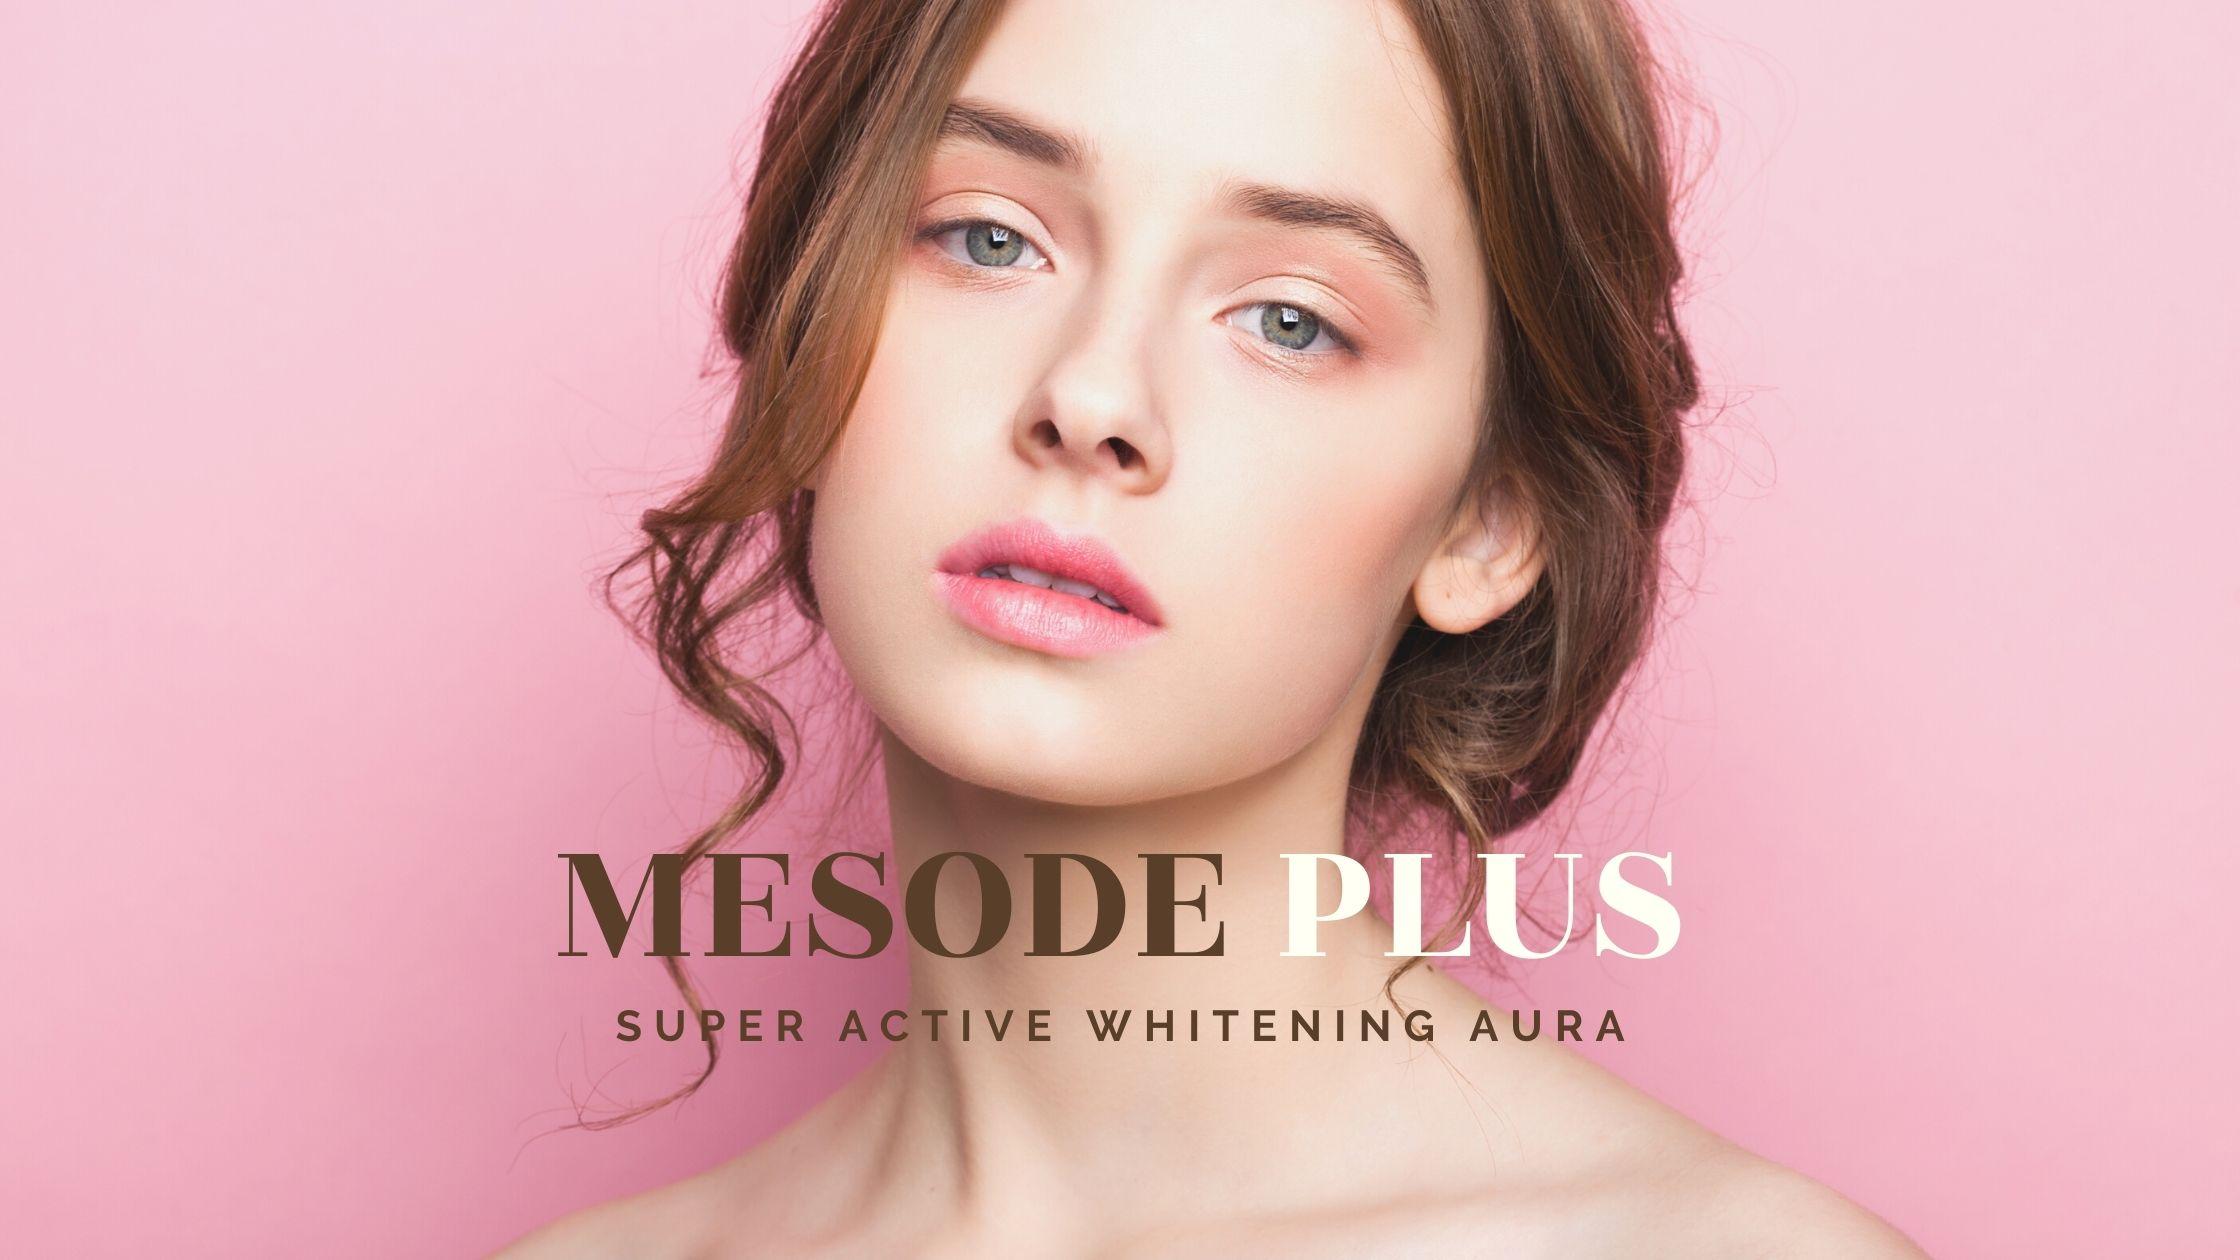 MESODE Plus